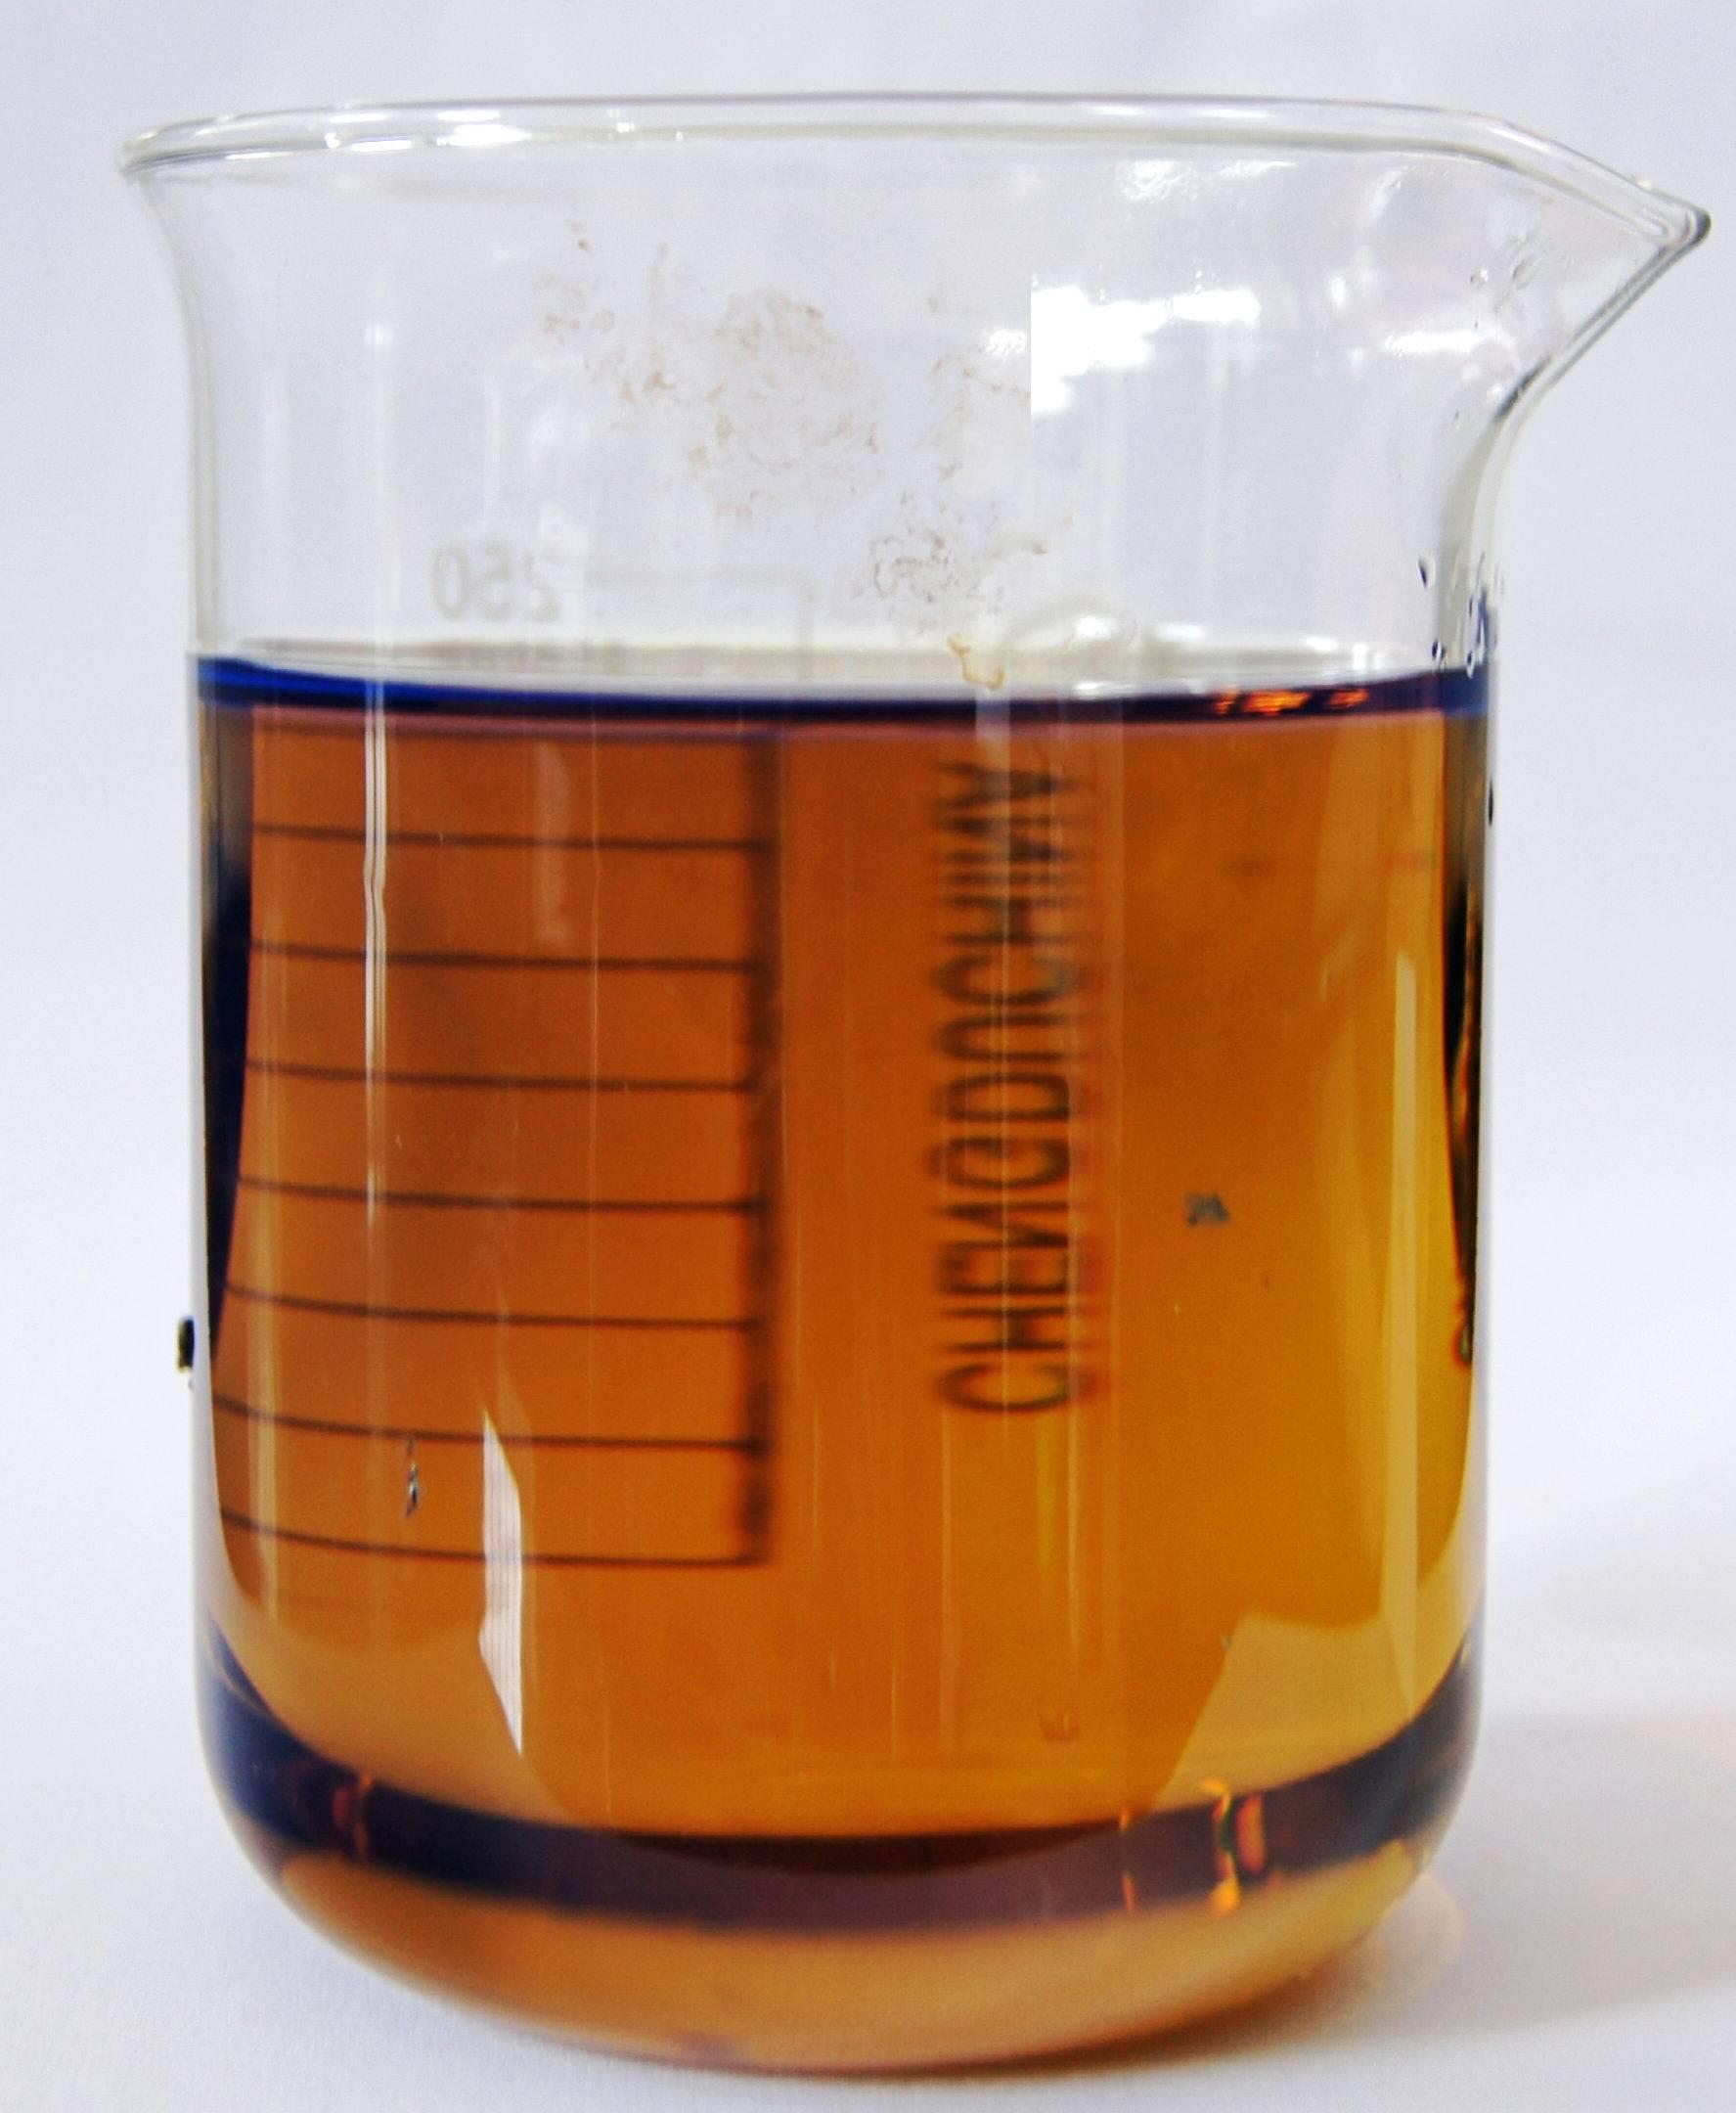 (S)-2-[(4-Chlorophenyl)(4-piperidinyloxy)methyl]pyridine (CAS 201594-84-5)